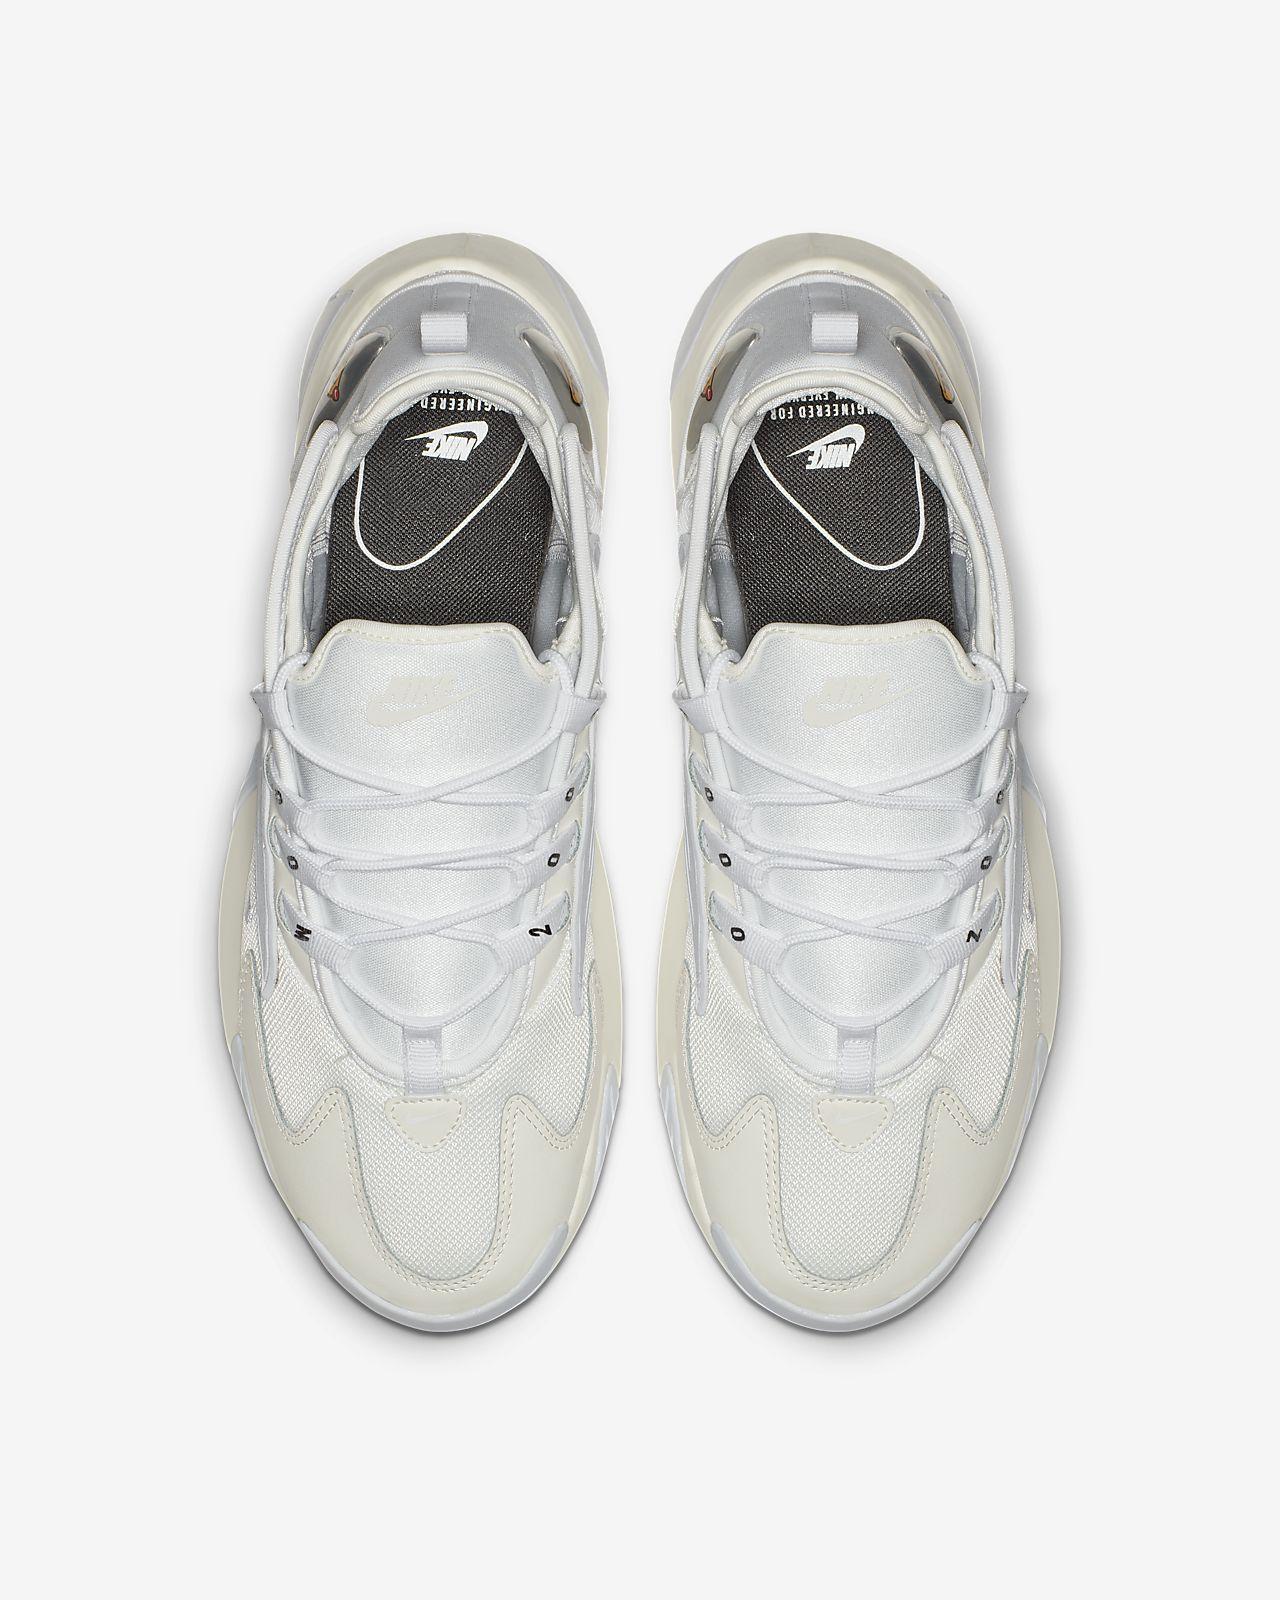 1b25c1e58 Nike Zoom 2K Zapatillas - Hombre. Nike.com ES